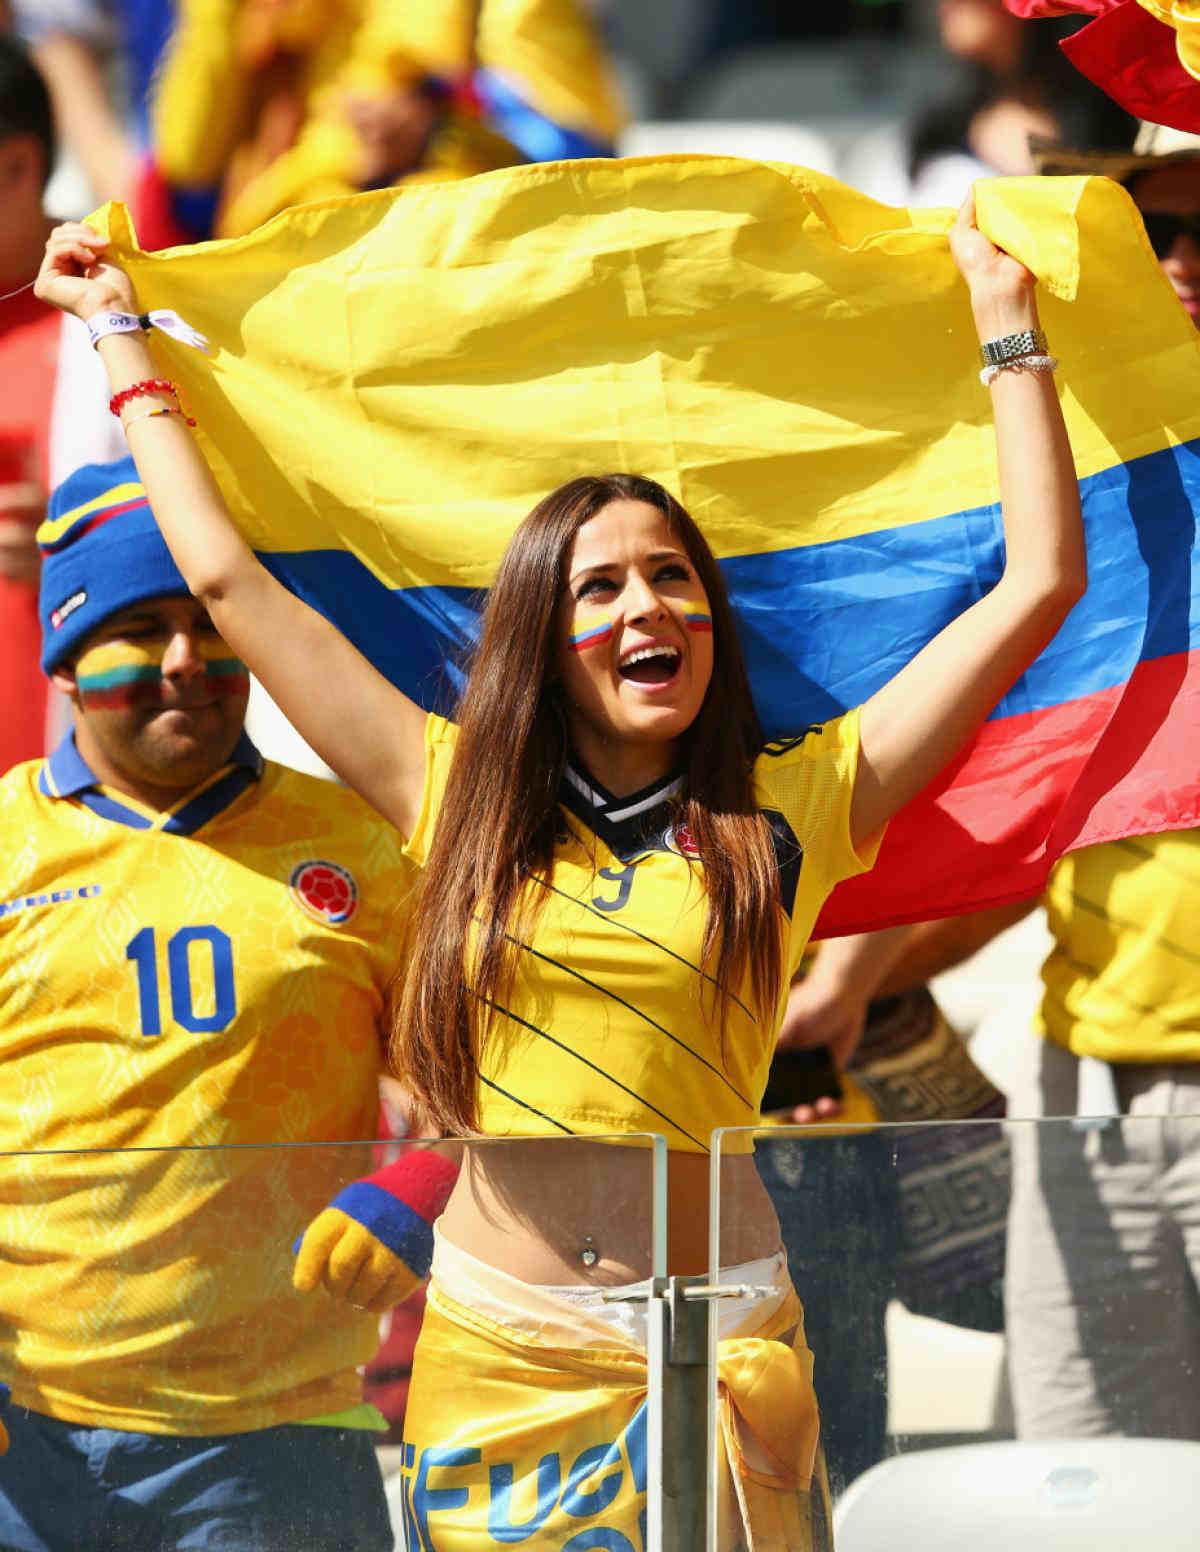 2. Colombia 10 دول مع جماهير كرة القدم الأكثر جاذبية في كأس العالم